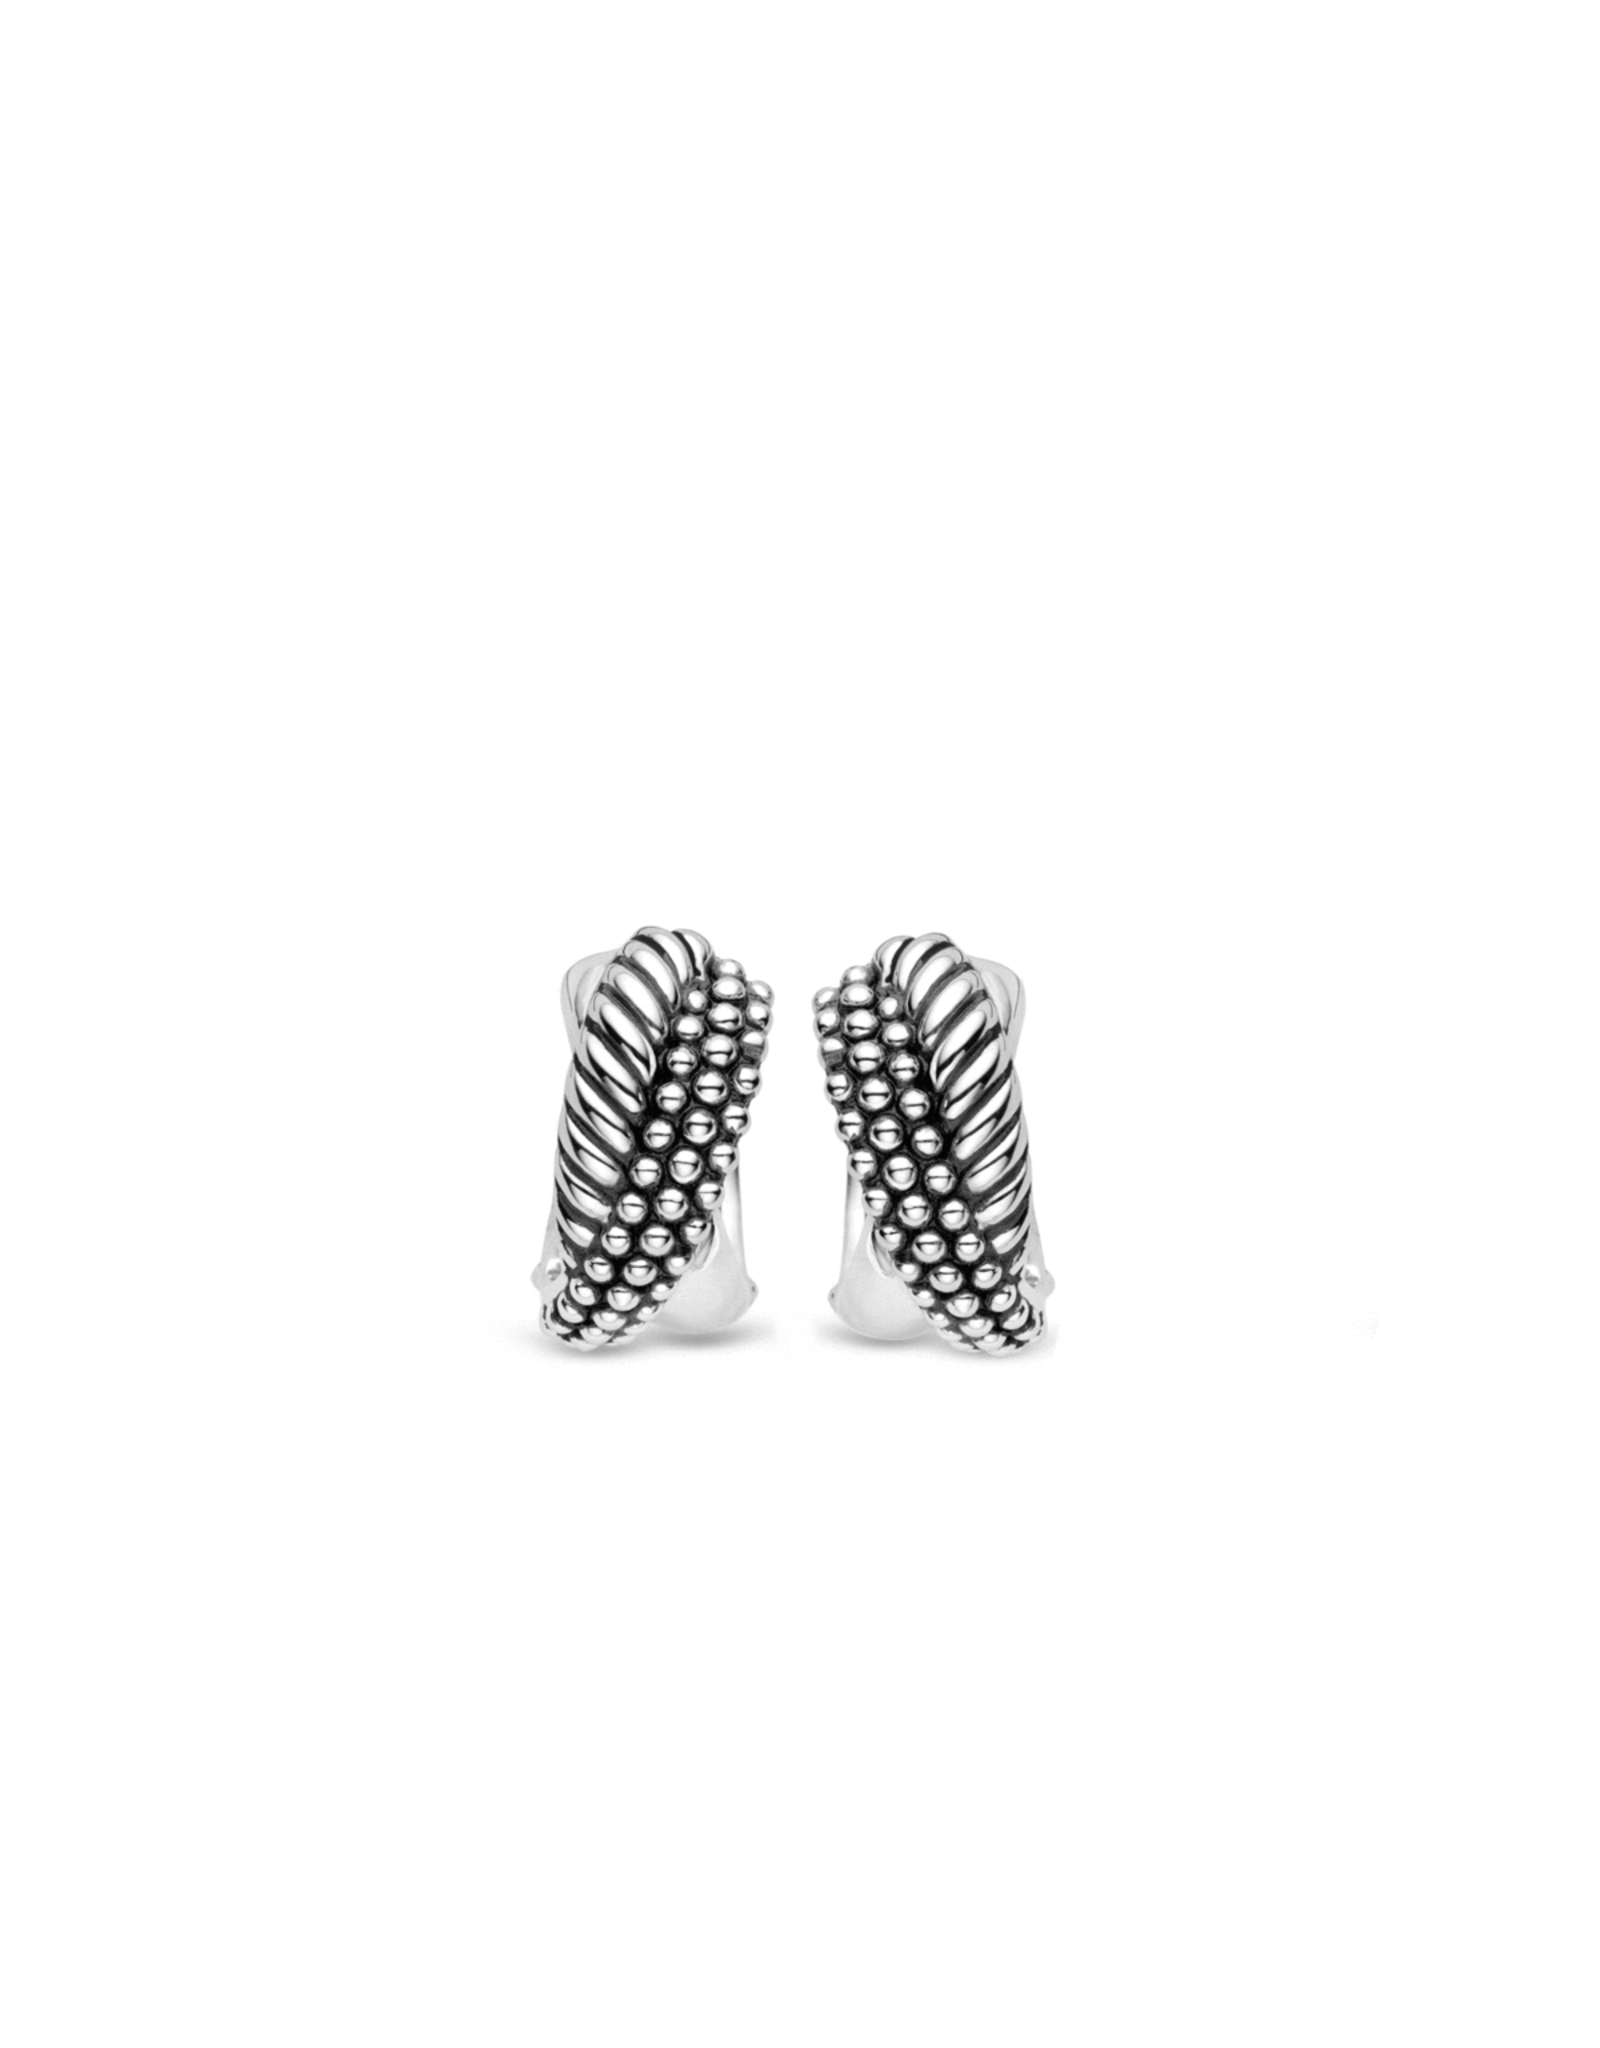 Silver Chunky Textured Huggie Earrings- 7692SB